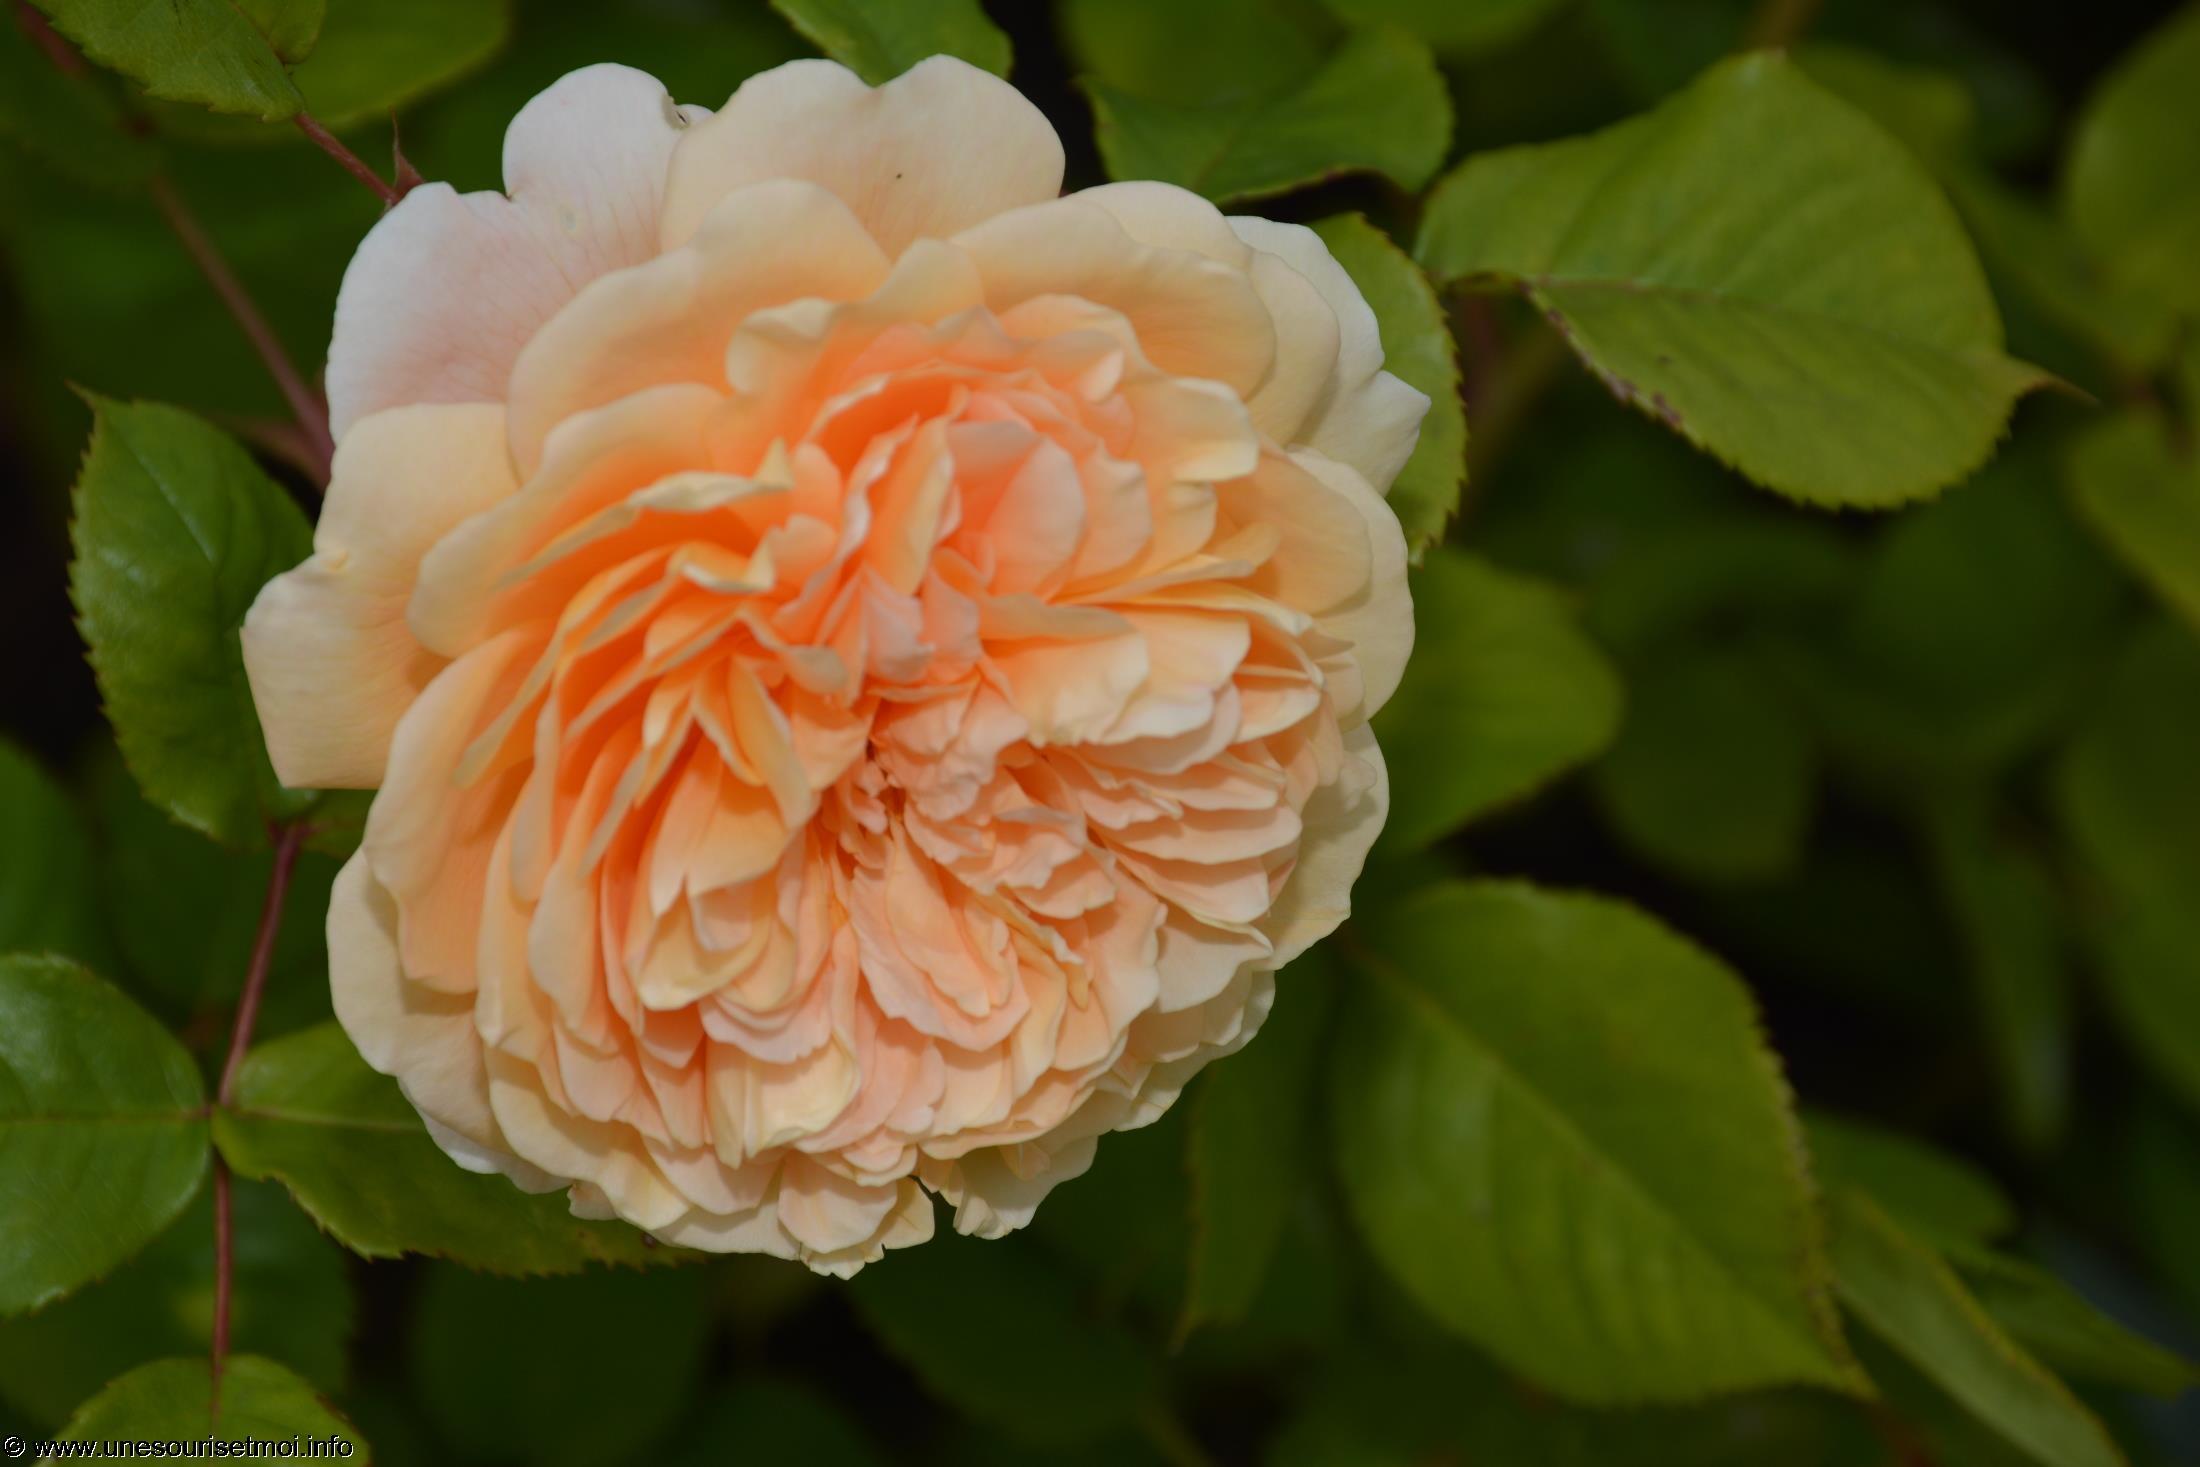 fleurs-ete-printemps-du-jardin-en-grand-format-HD_10